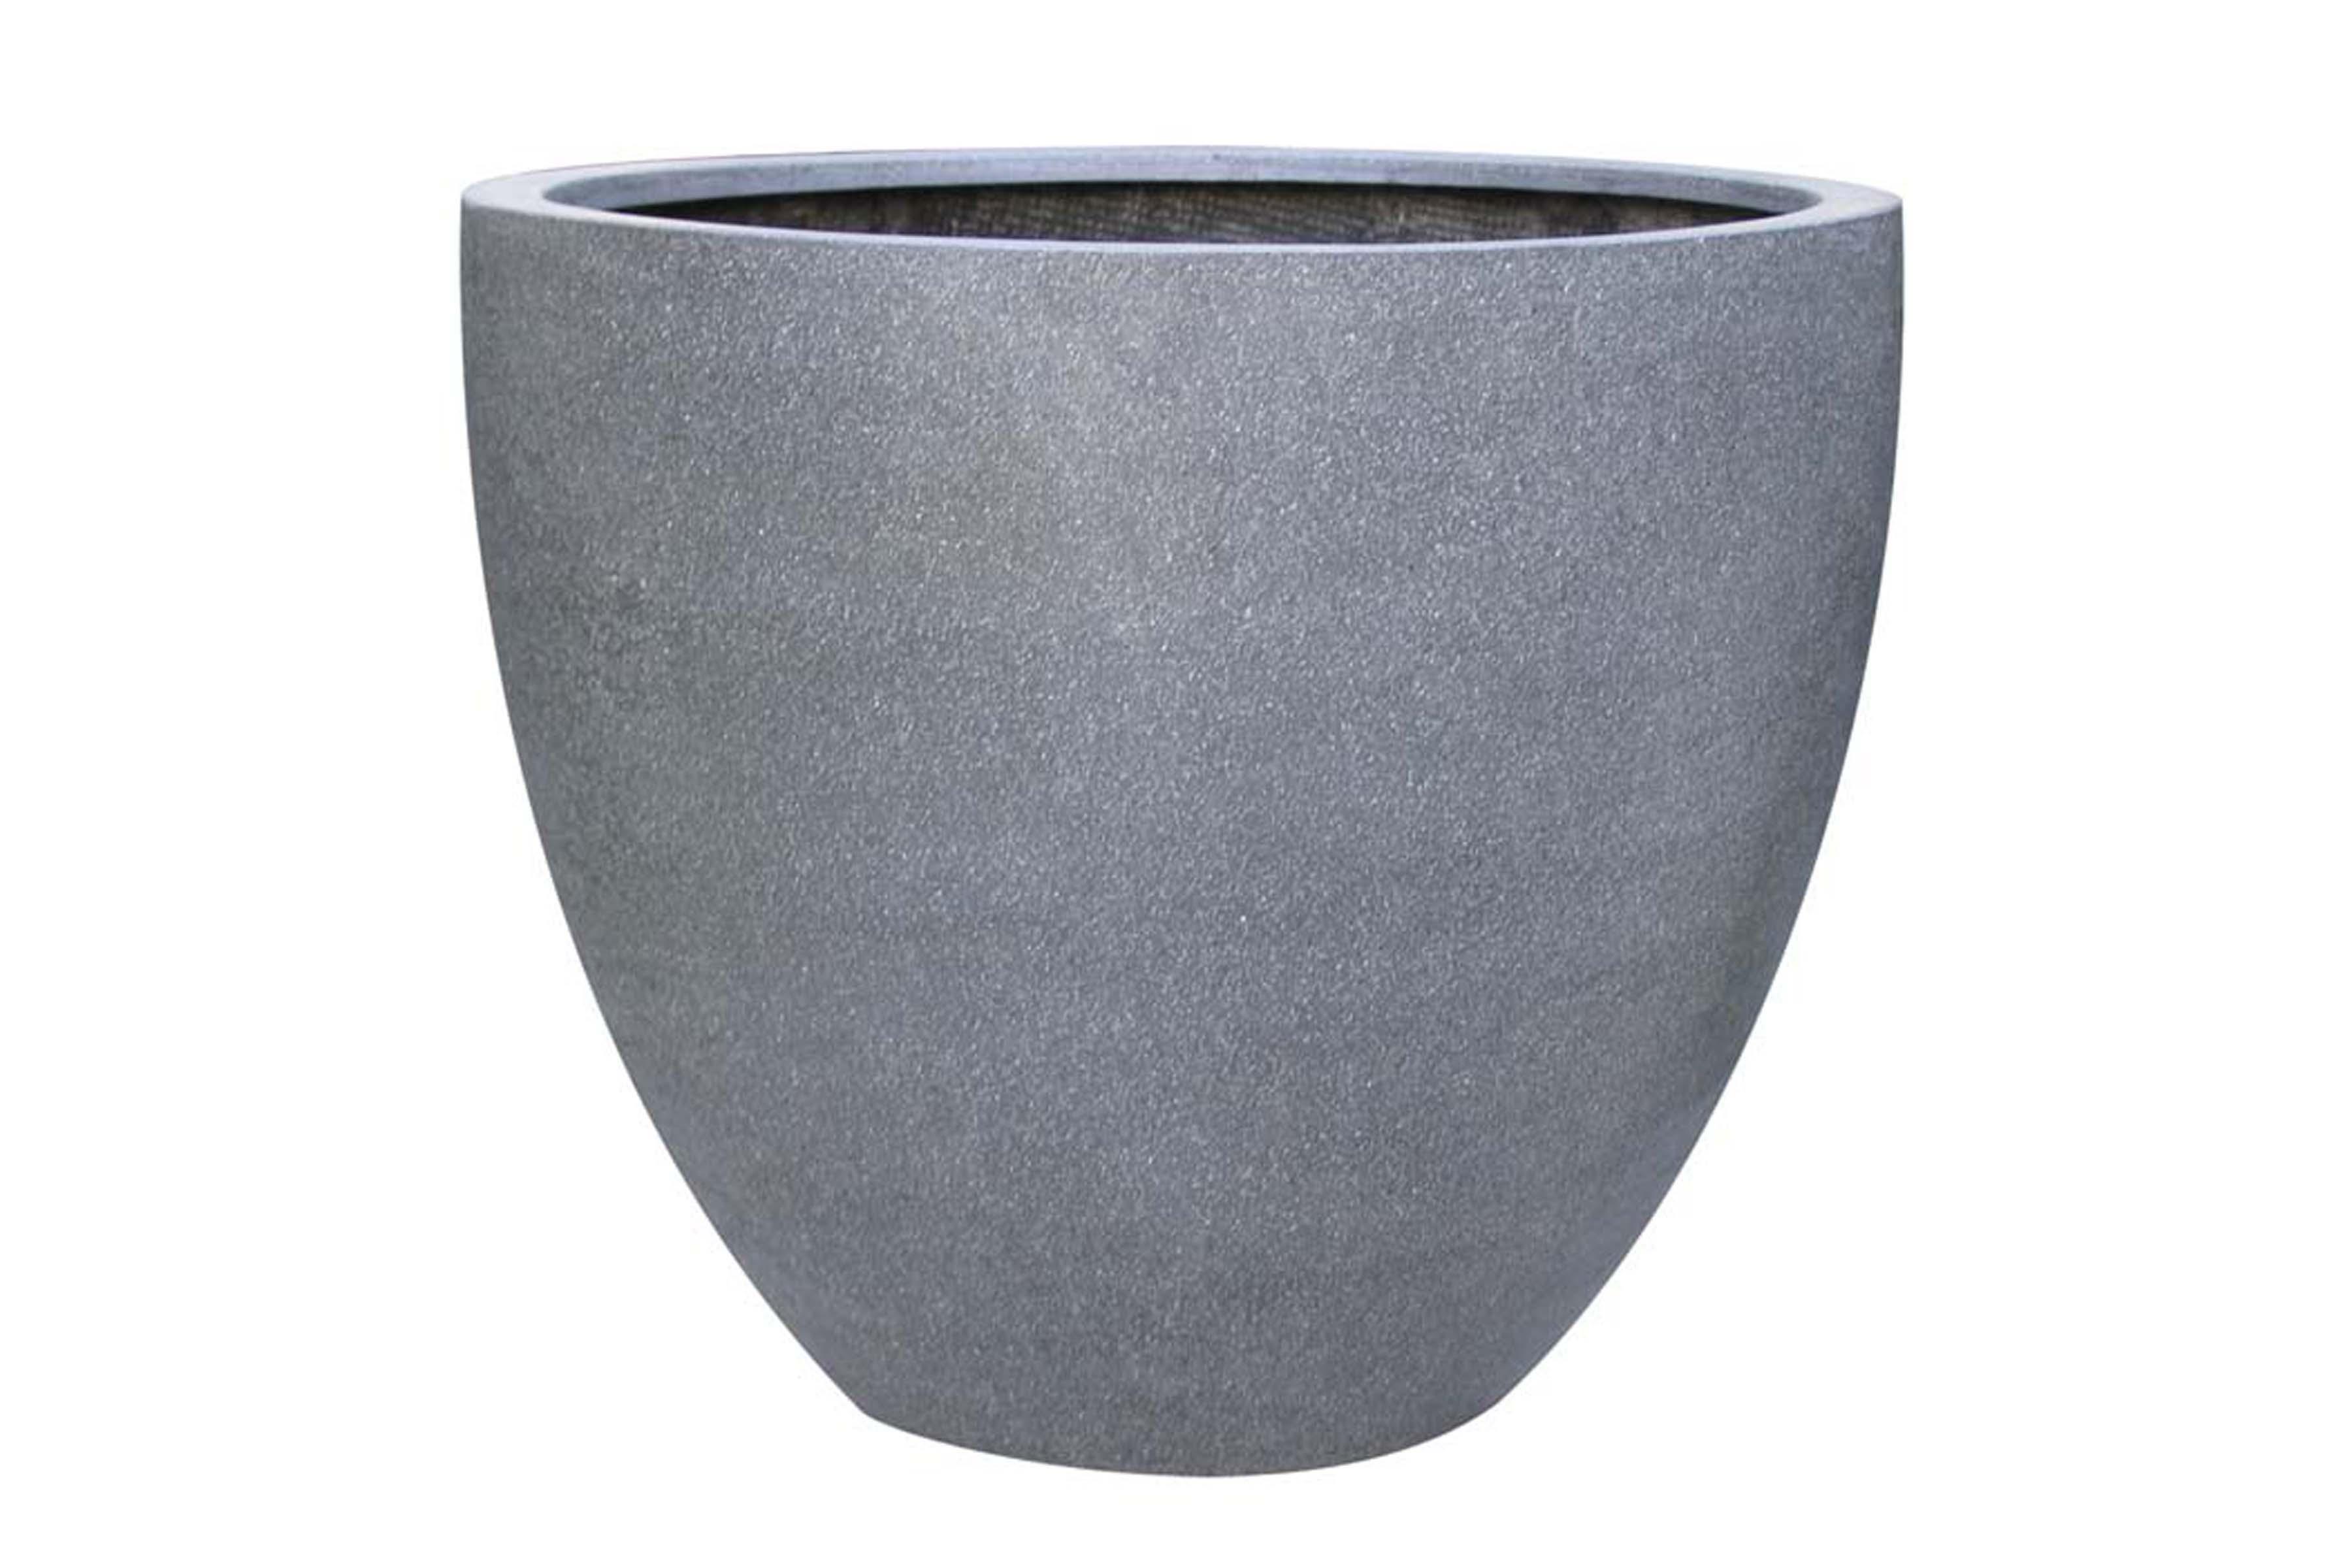 Terrazzo Lotuspot grijs 33x29